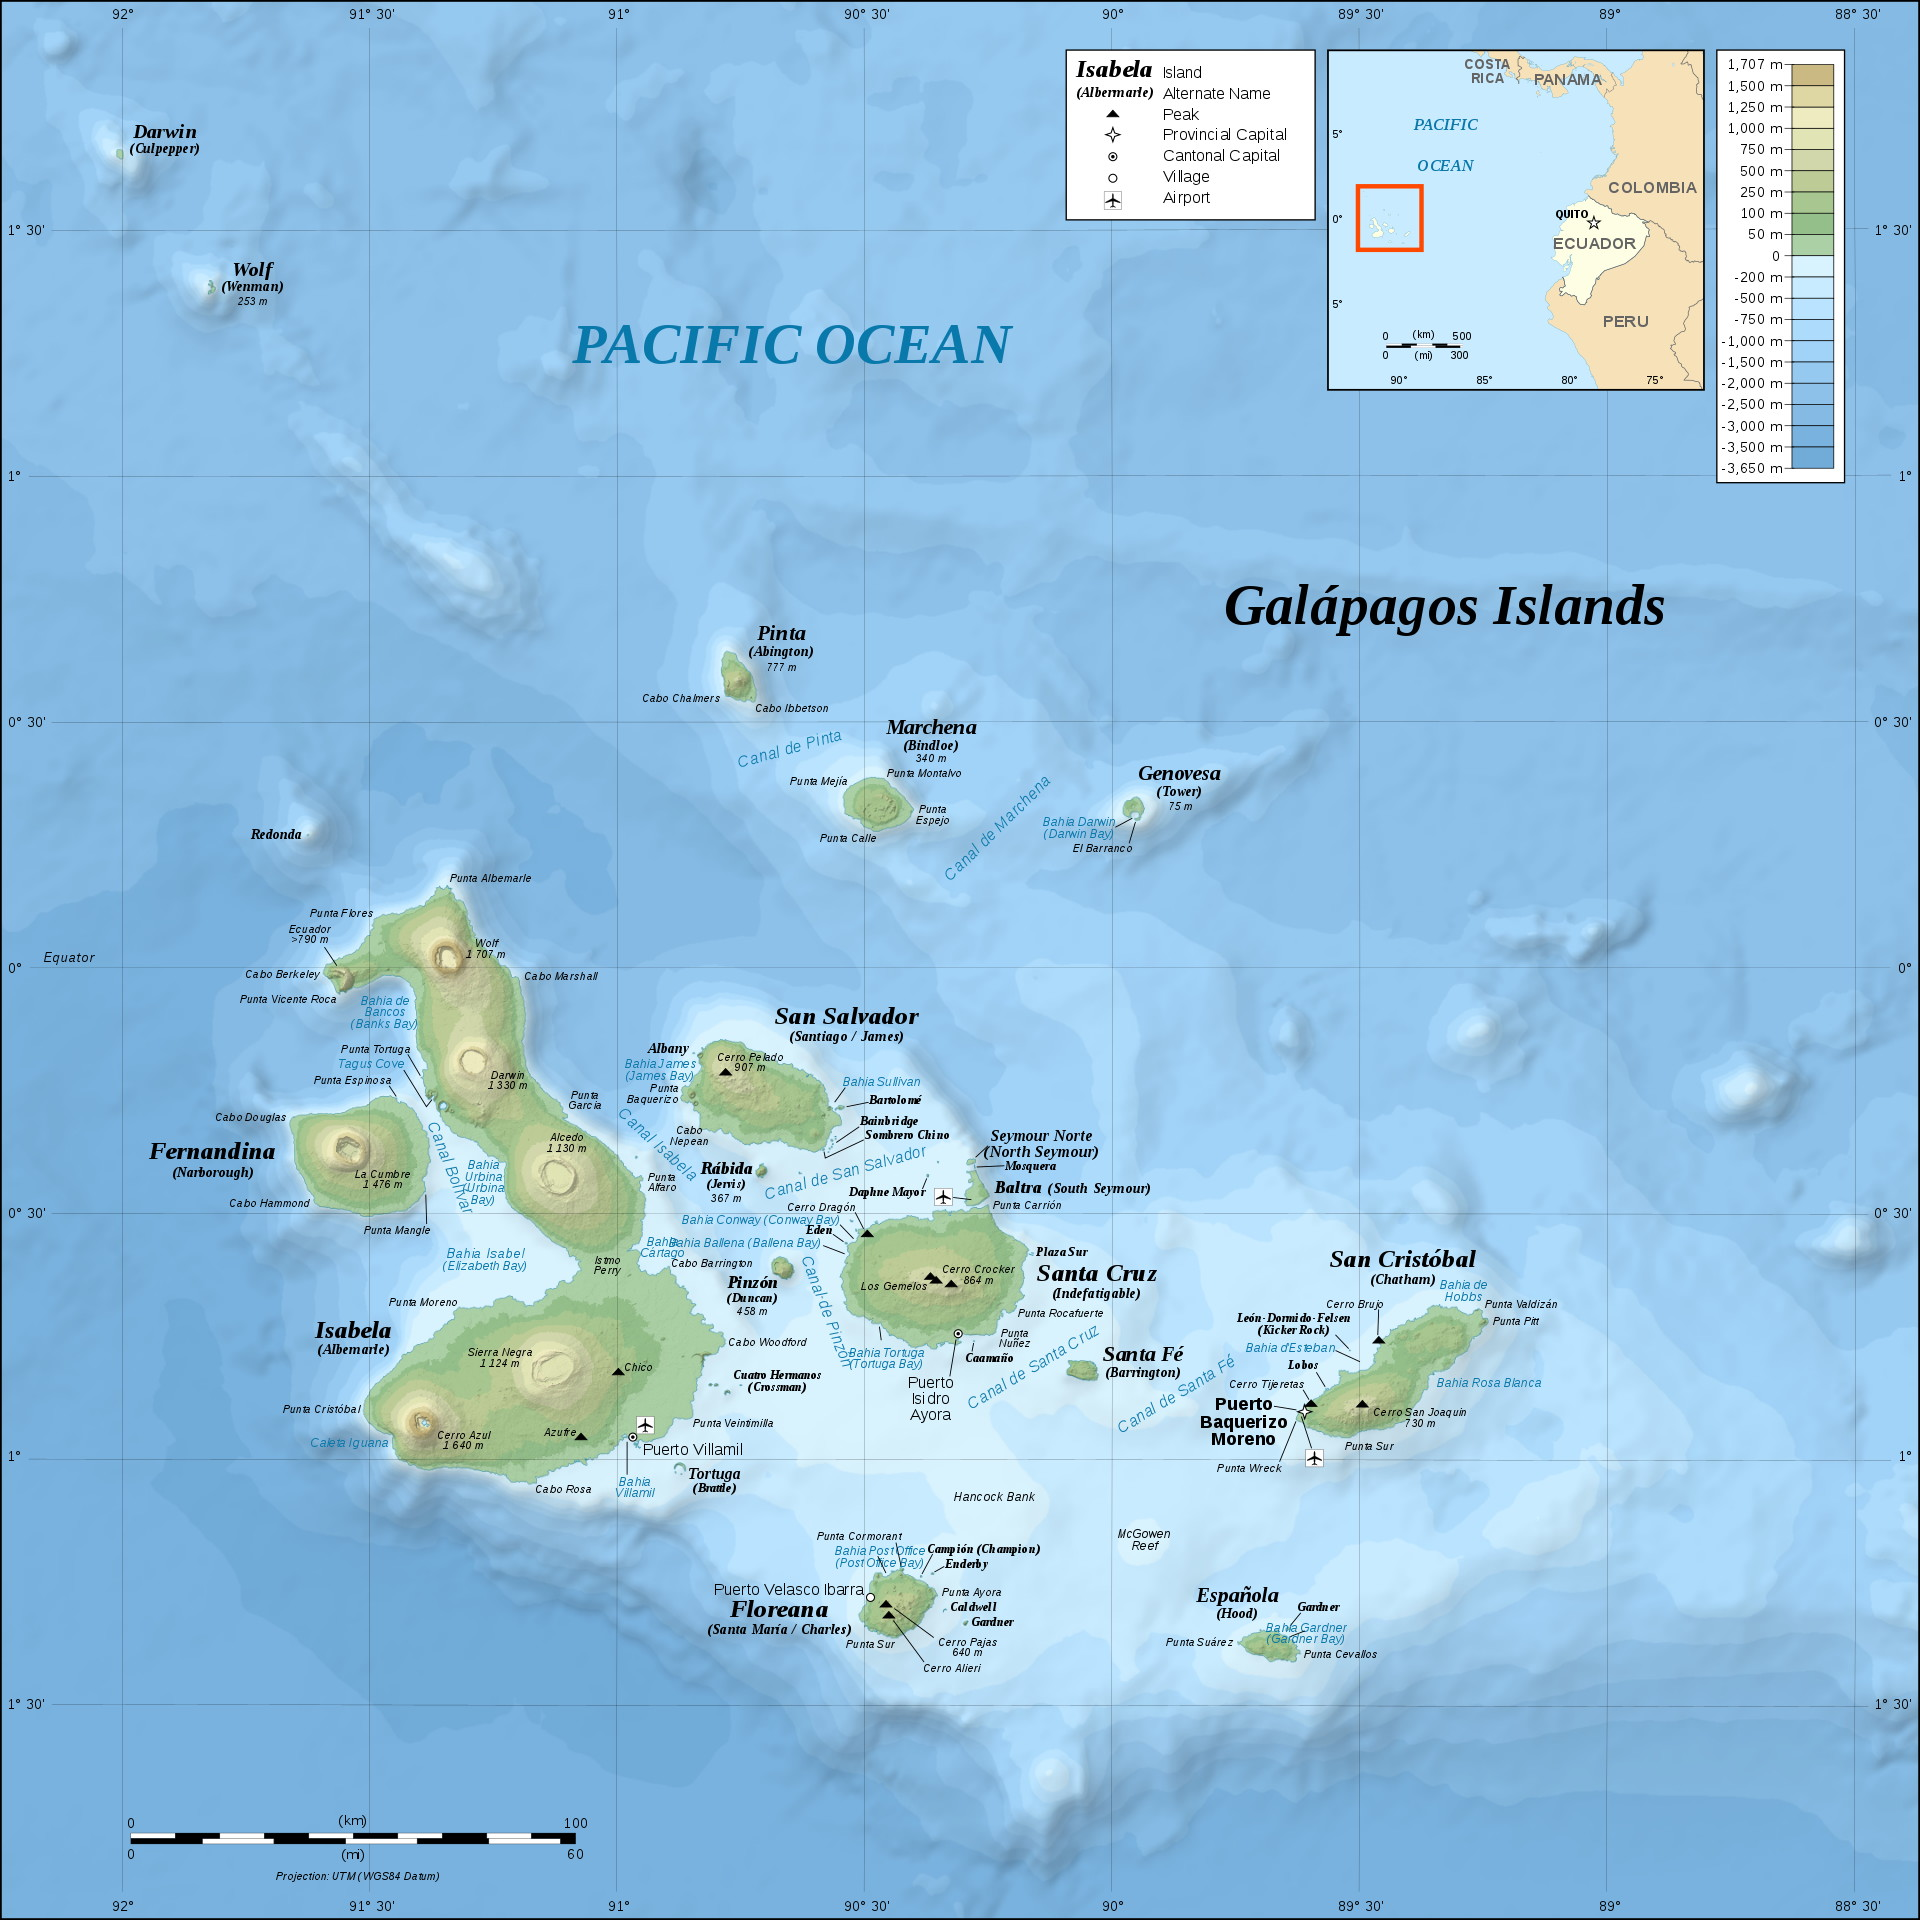 galapagos_islands_topographic_map-en.svg-2